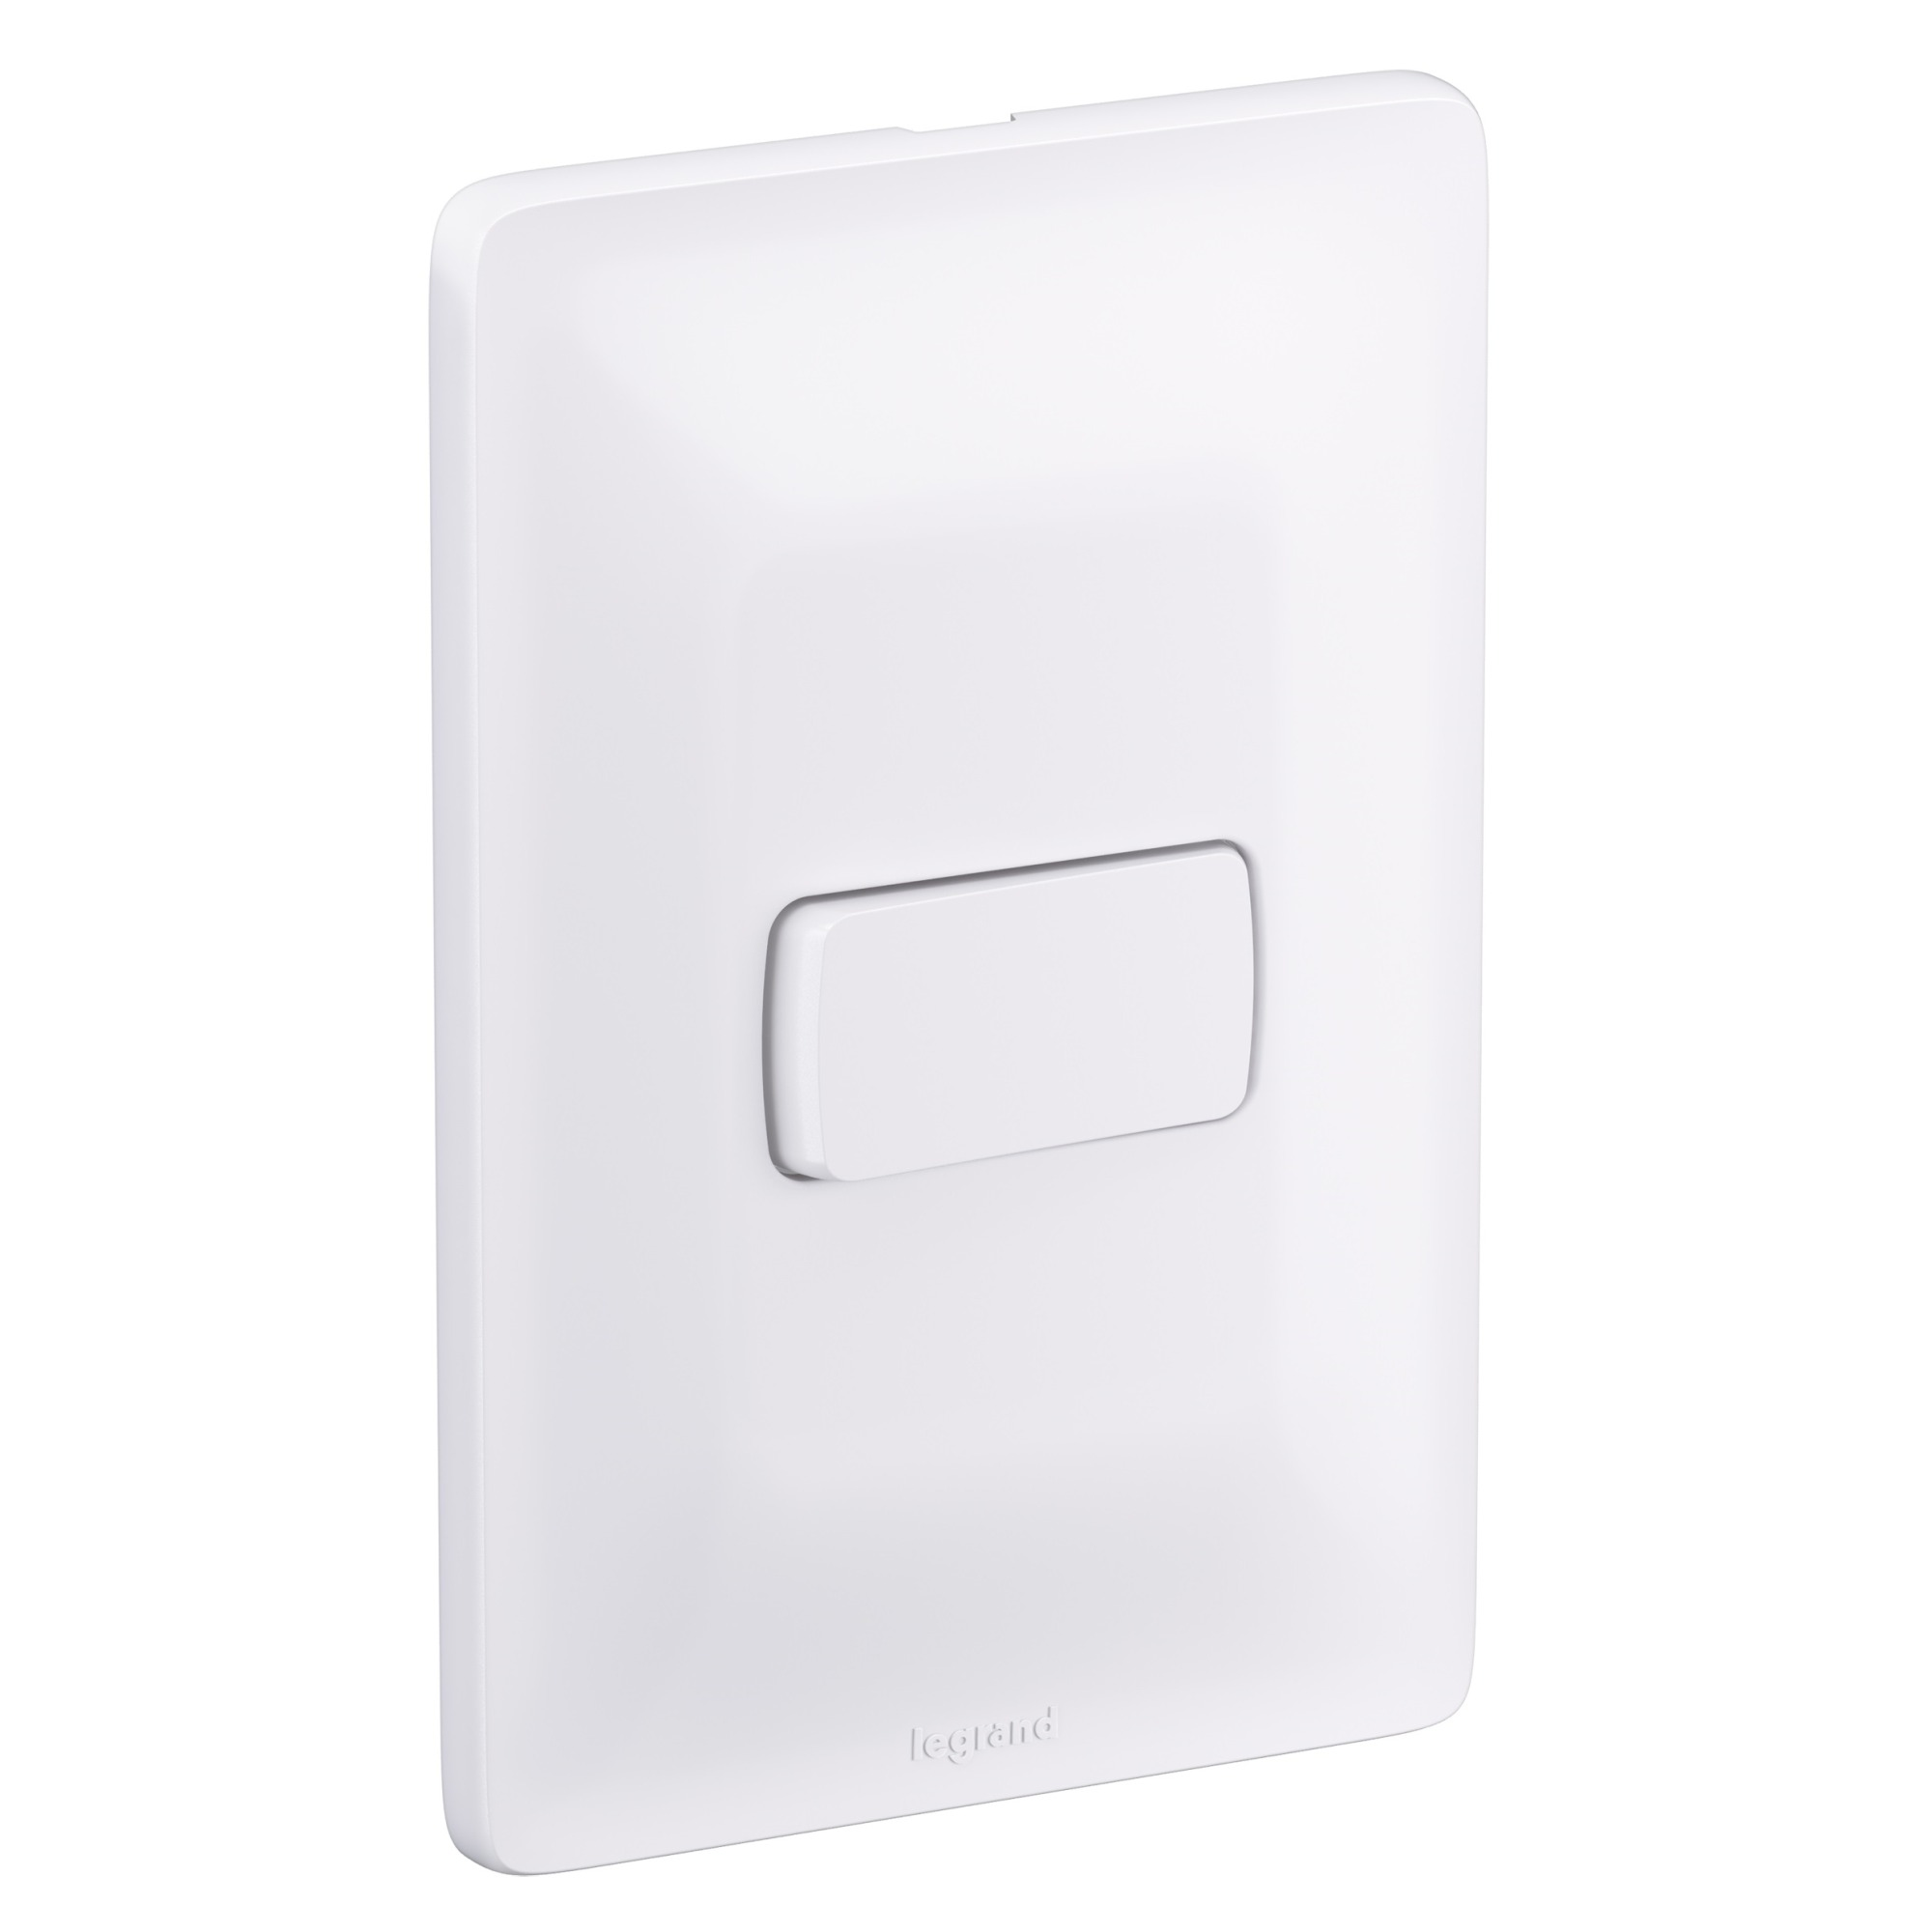 Conjunto Interruptor Simples 1 Modulo 10A - Branco - Zeffia - Legrand